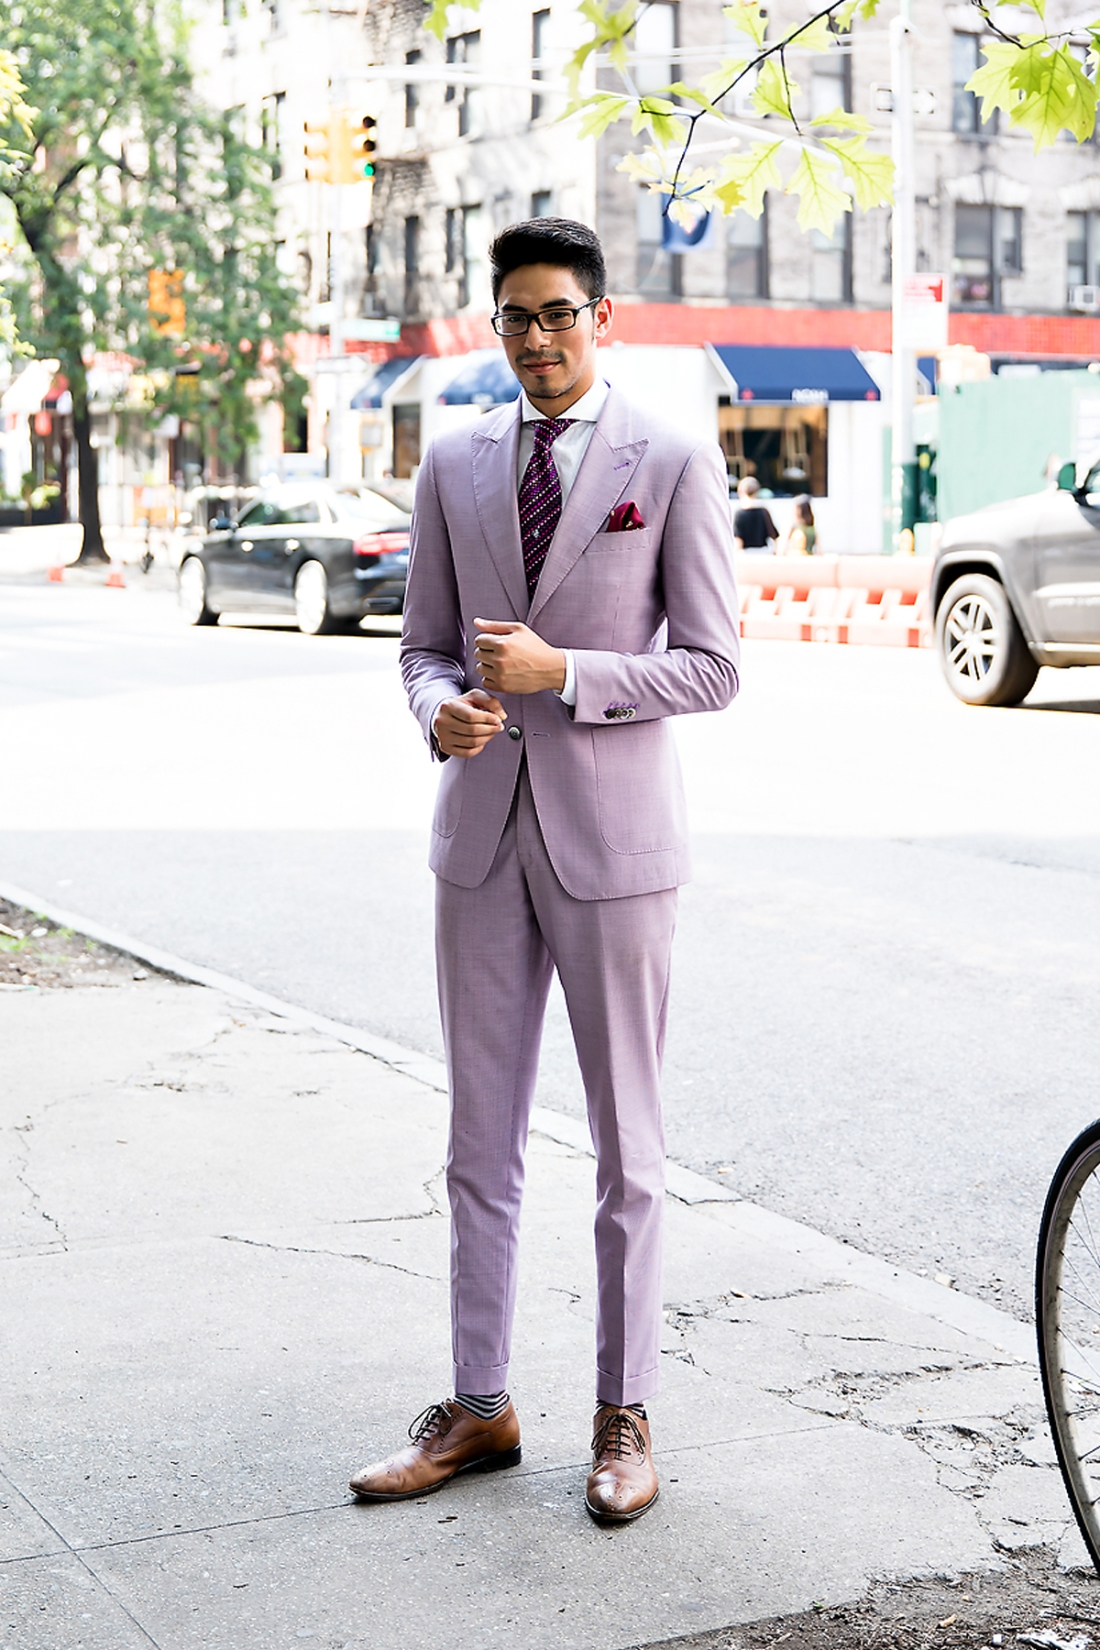 Joshua Zecena, Street Fashion 2017 in New York.jpg